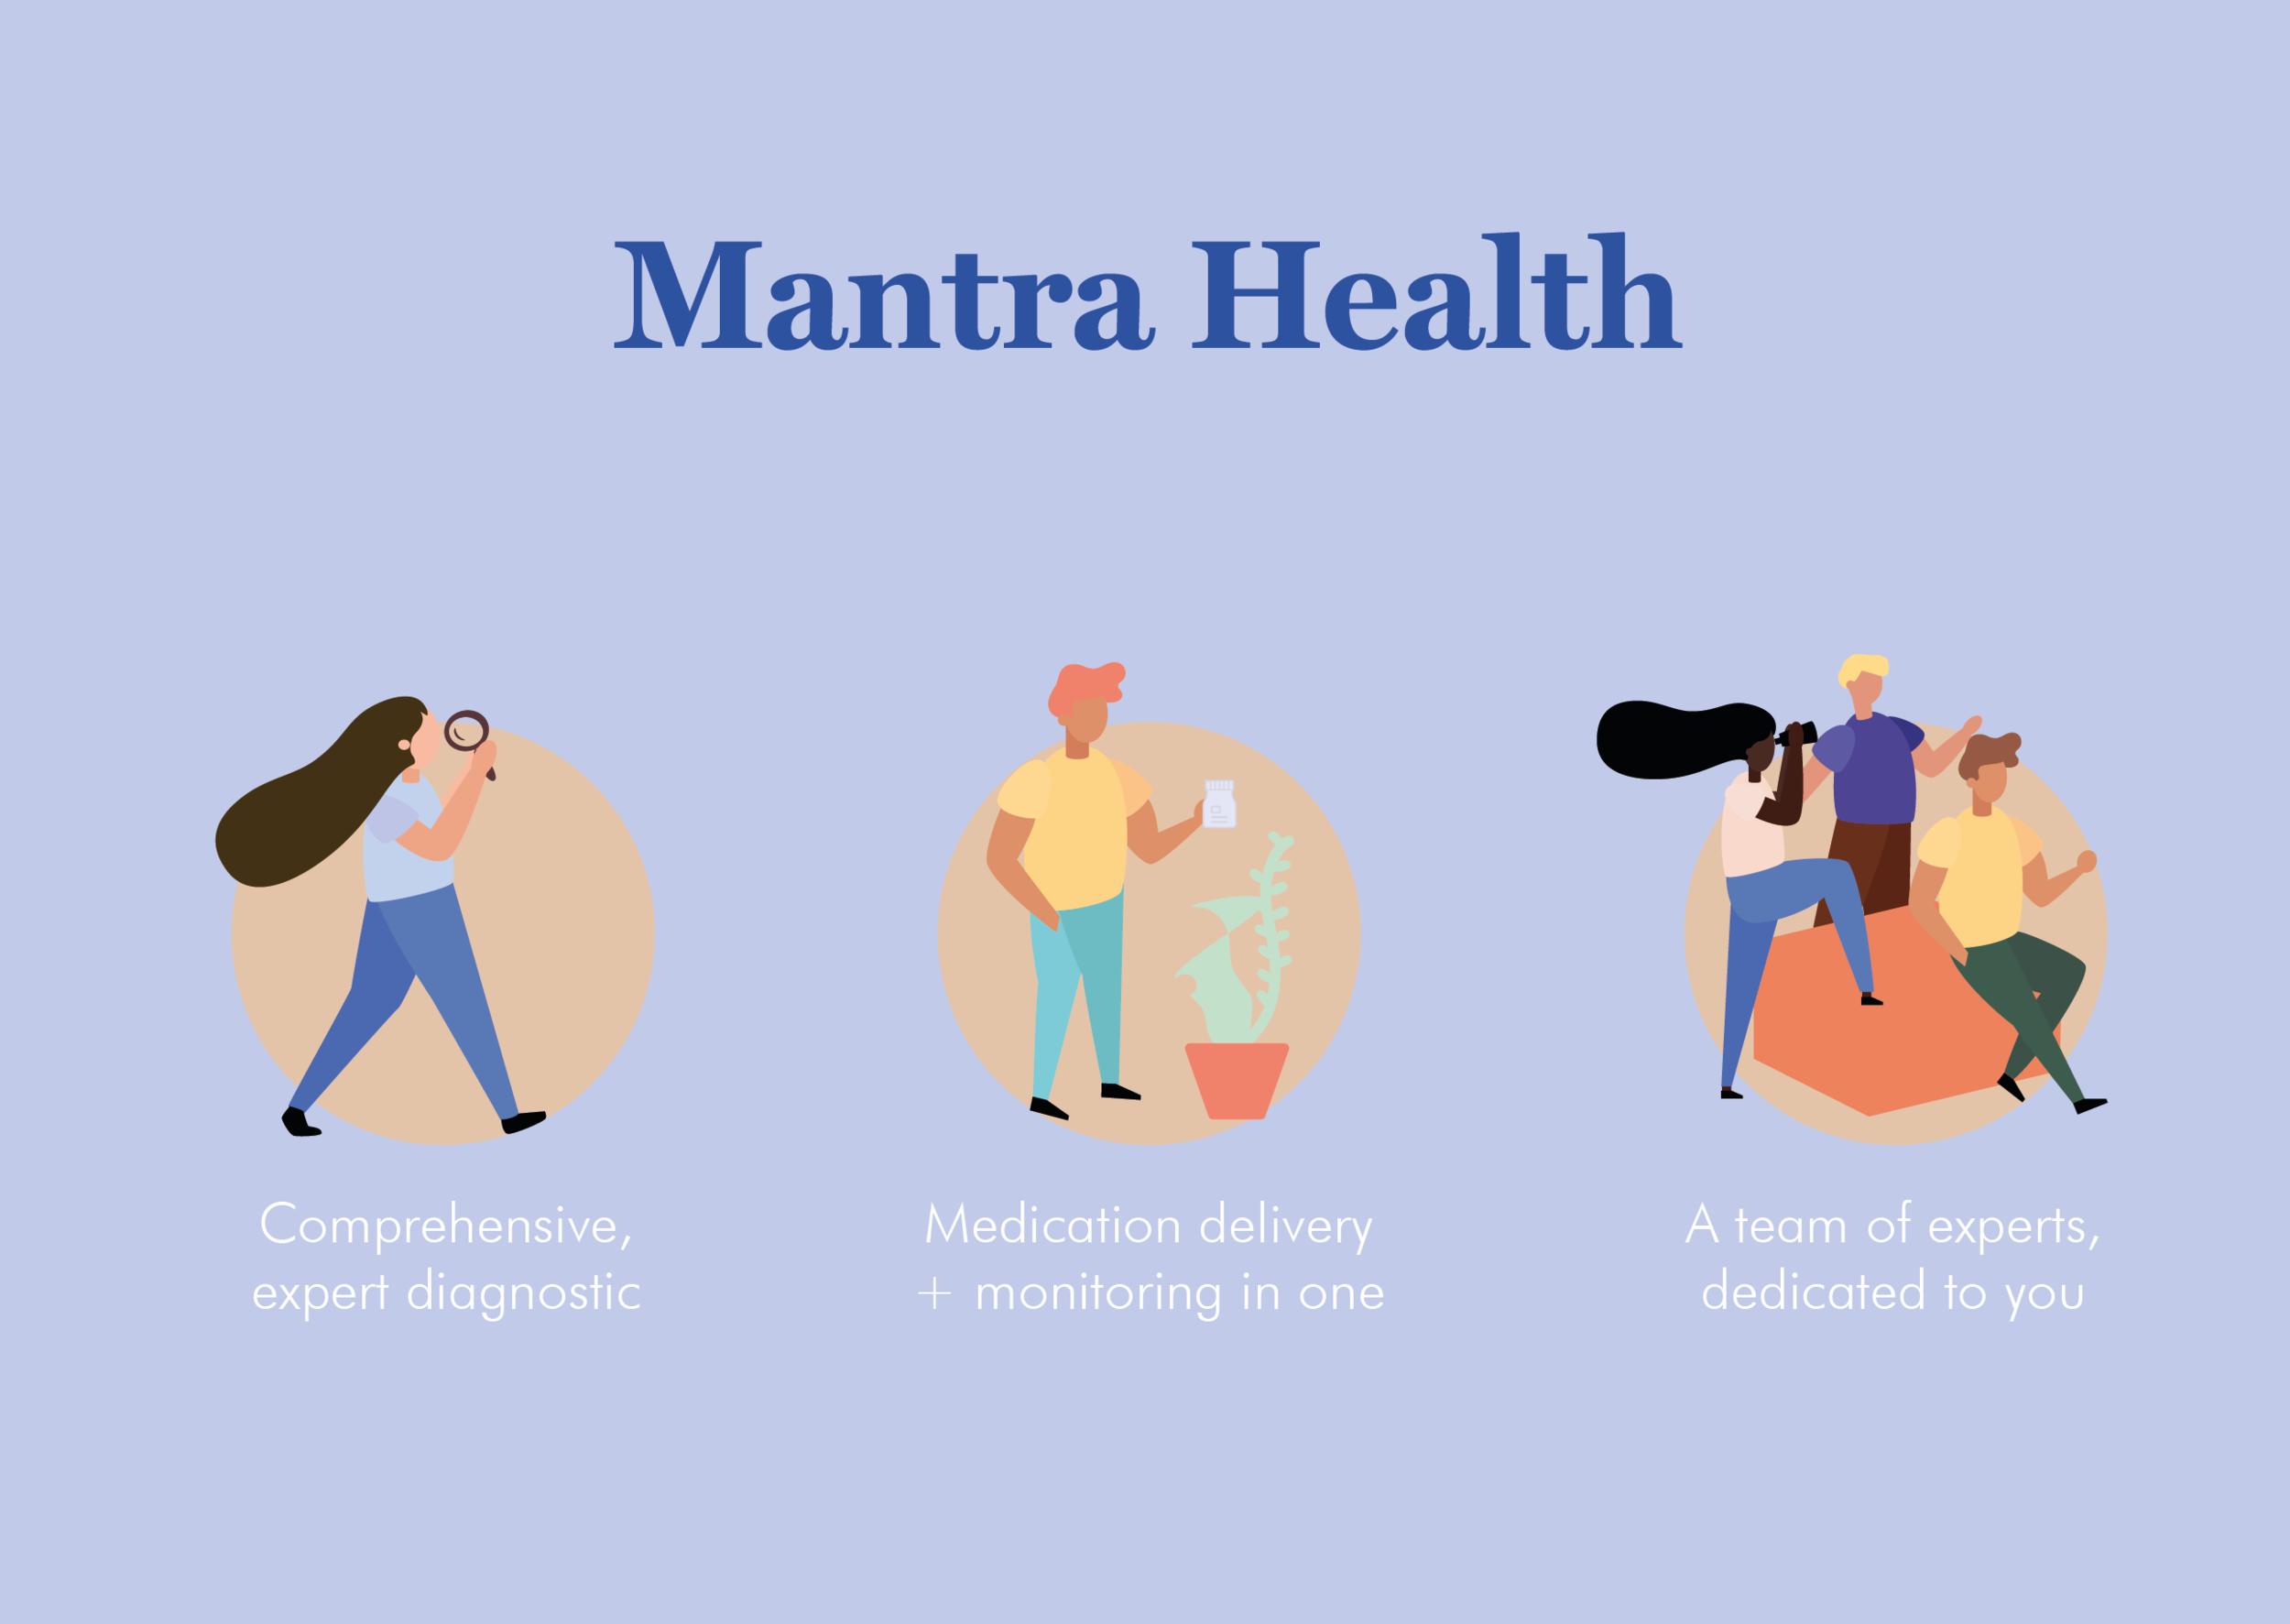 MANTRA HEALTH — DIANAX